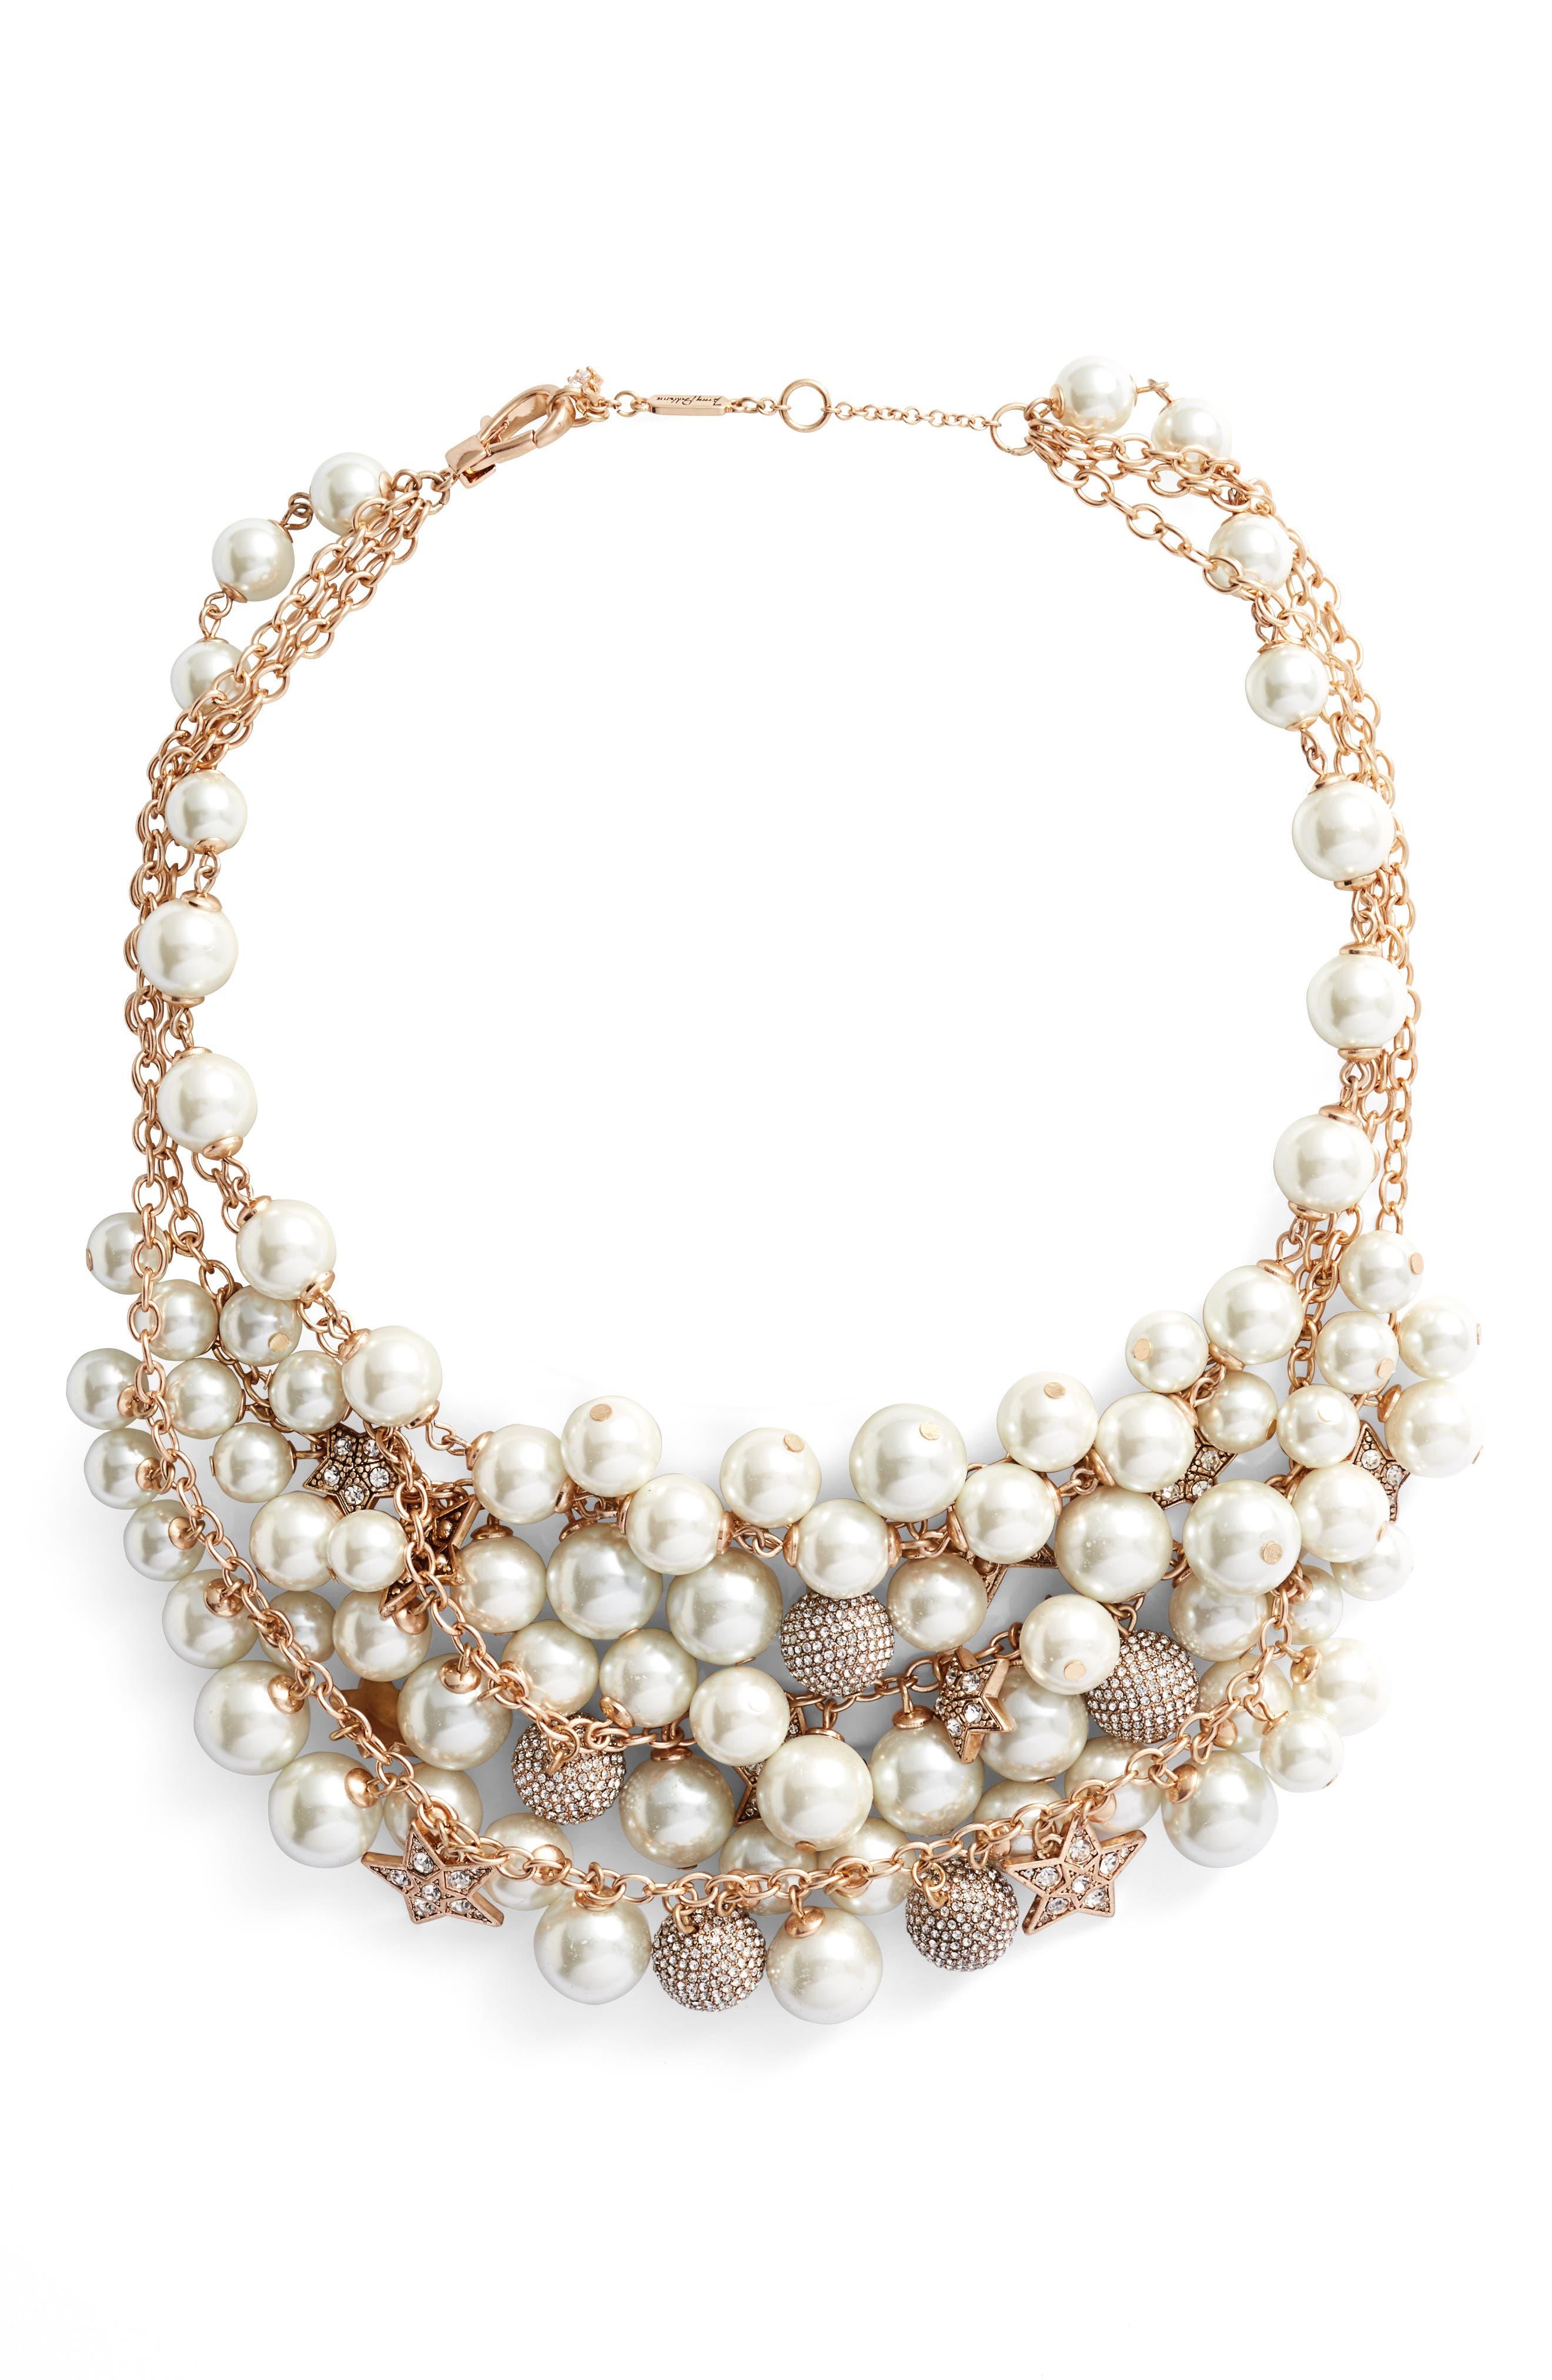 Shaky Drama Collar Necklace,                         Main,                         color, Gold/ Pearl/ Crystal